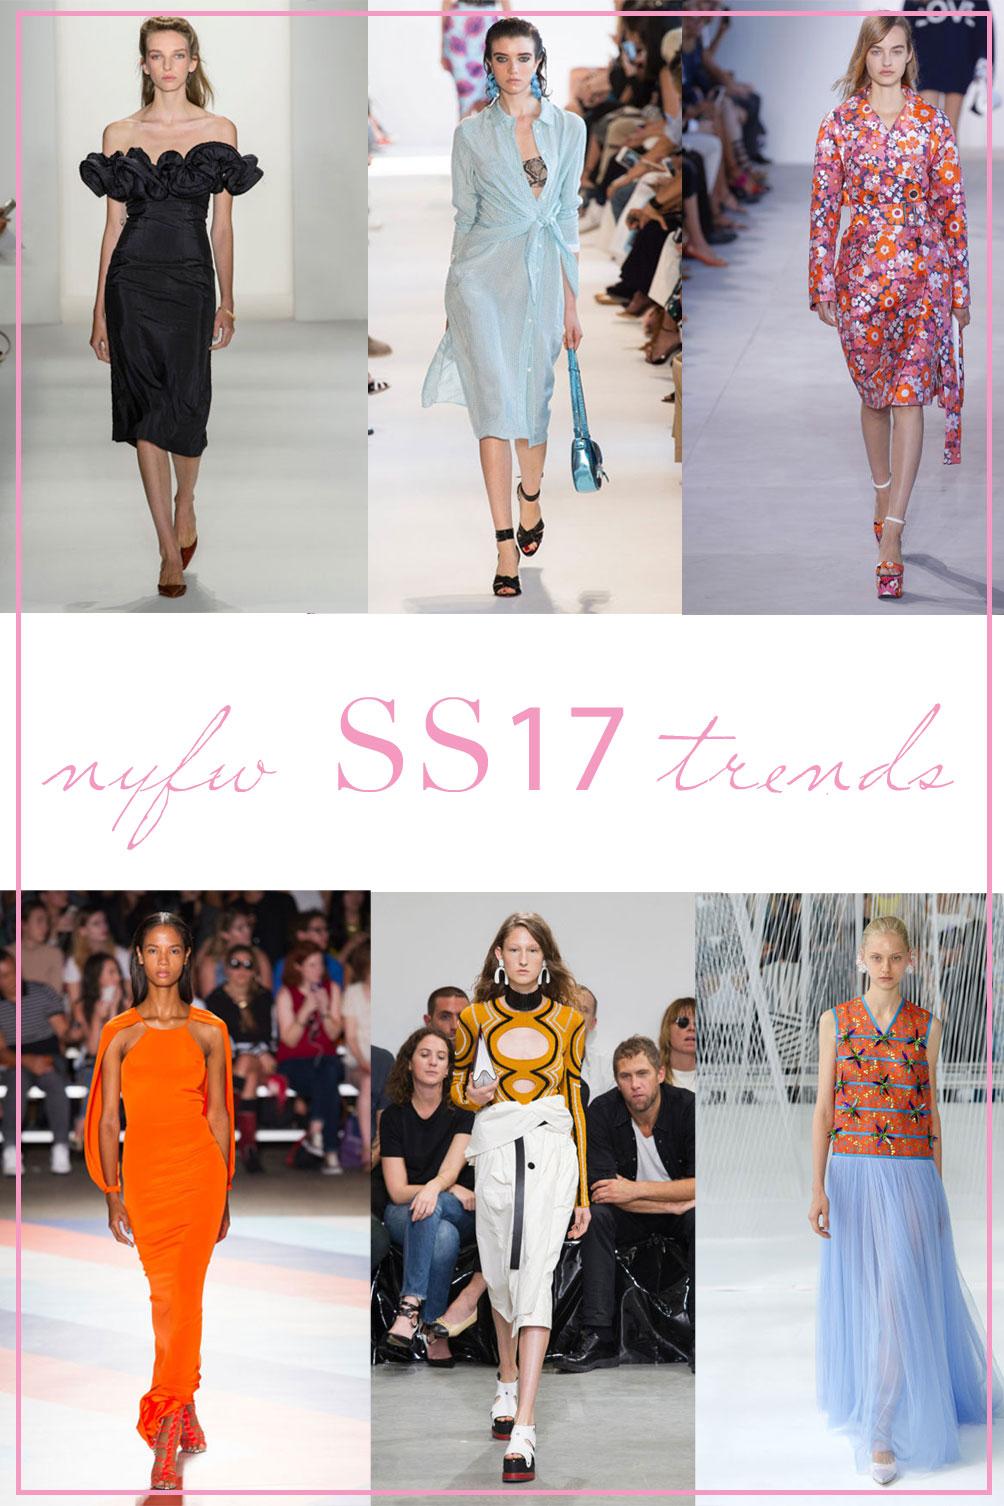 nyfw SS17 trends